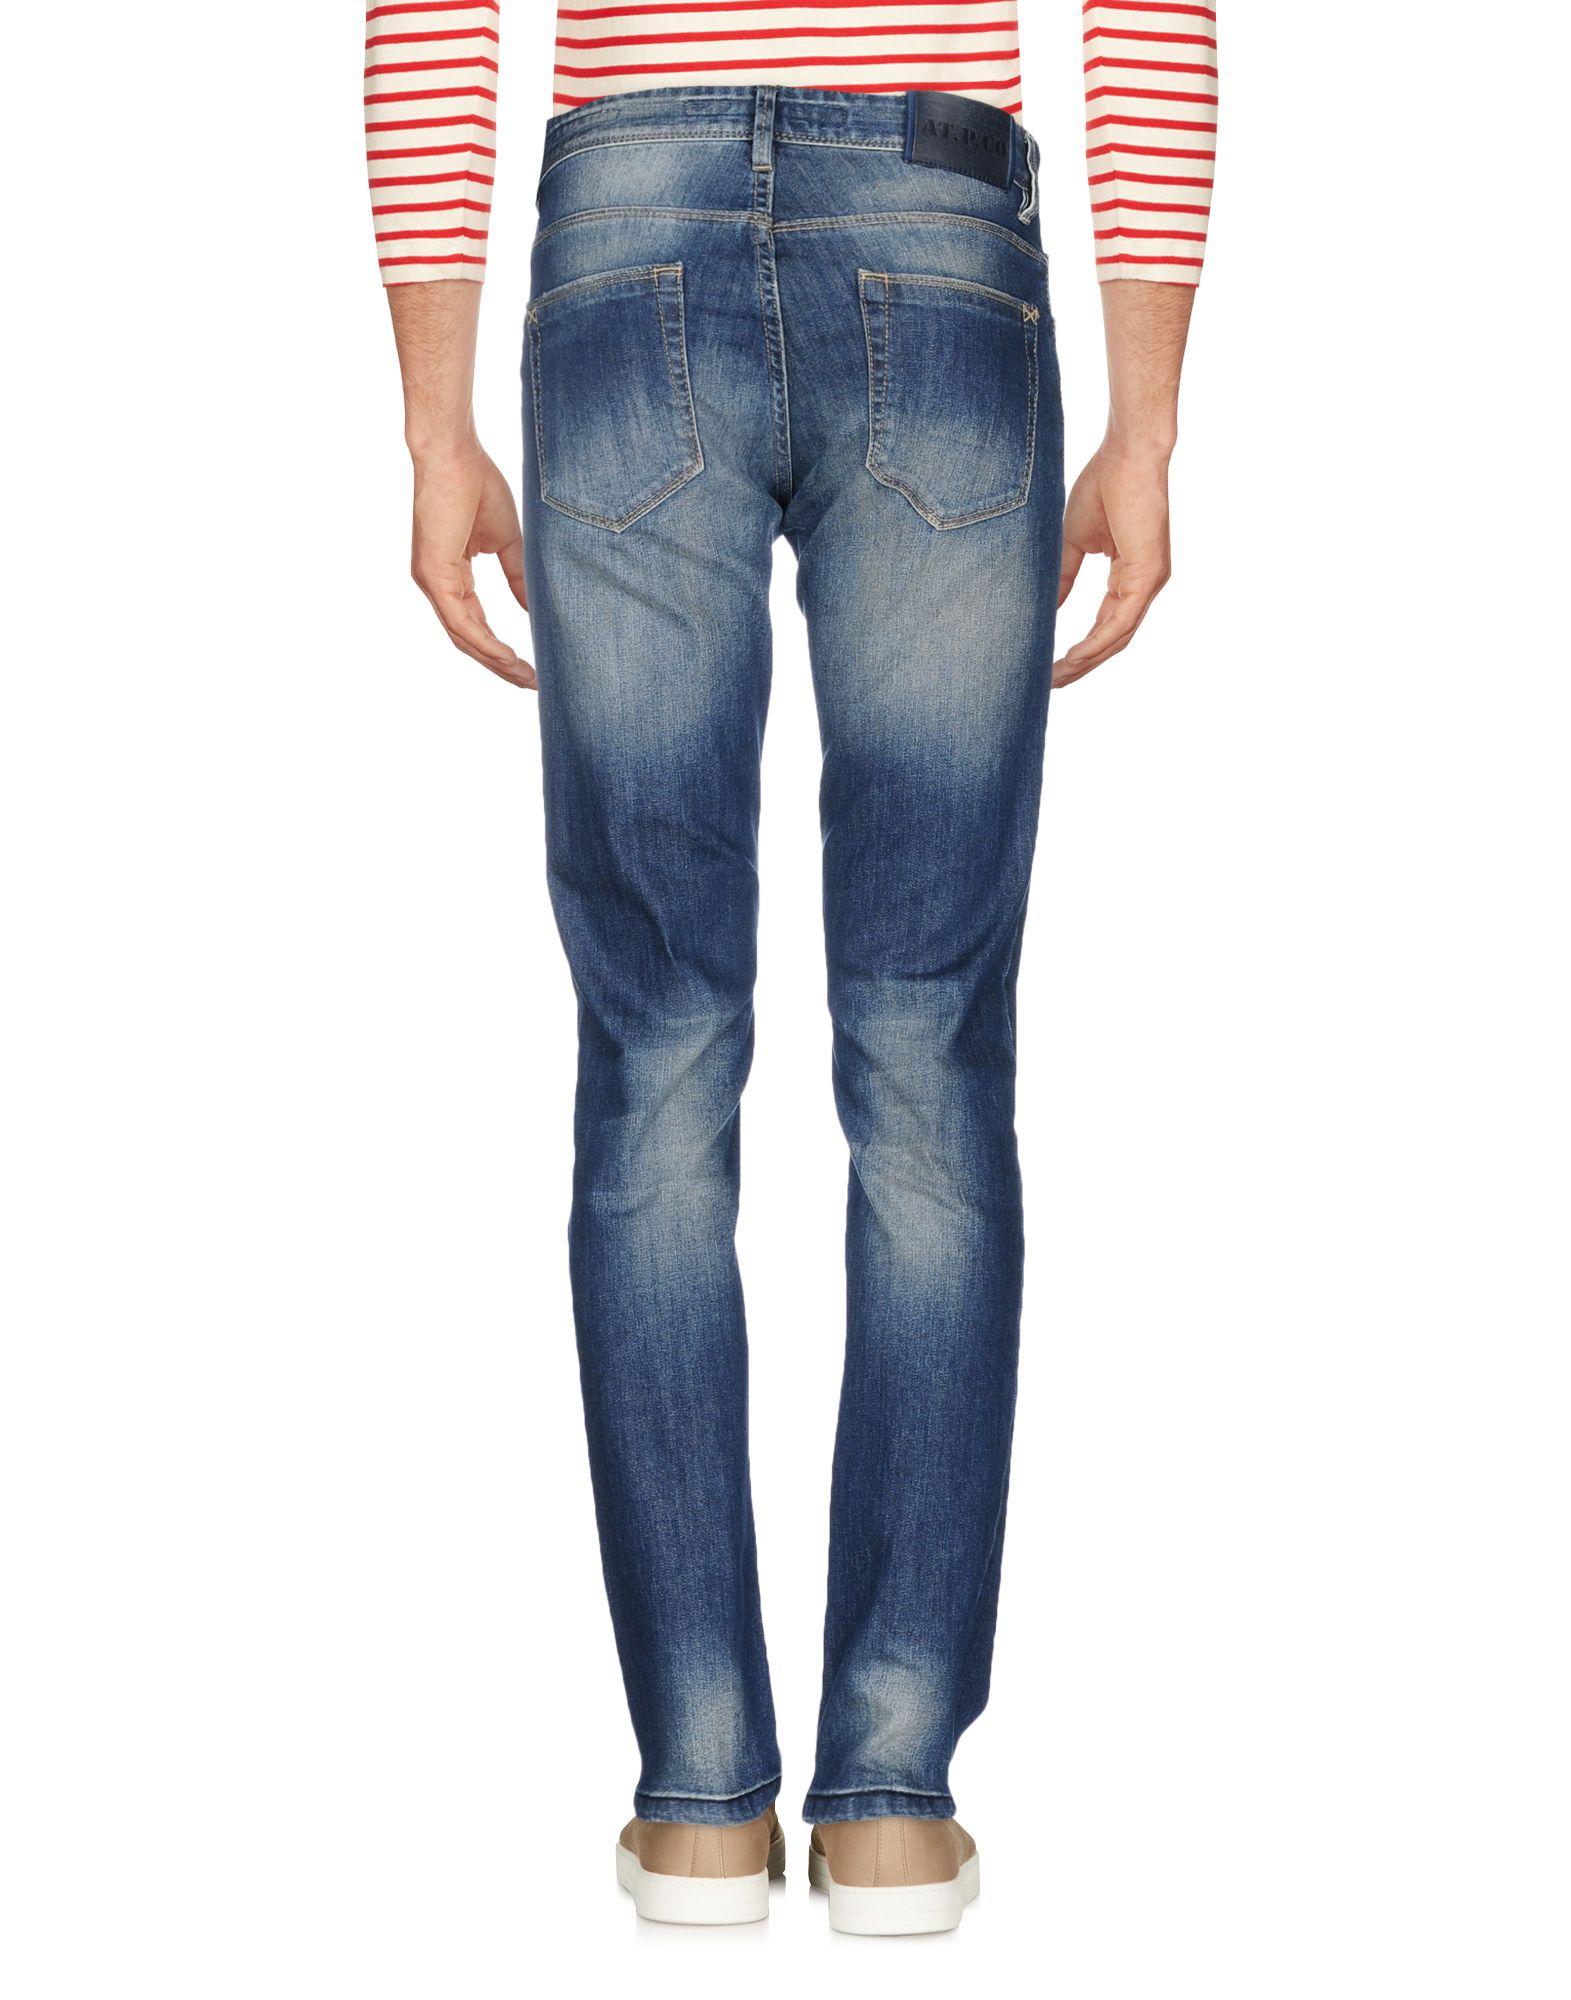 Pantaloni Jeans At.P.Co At.P.Co Jeans Uomo - 42643823GF e74324